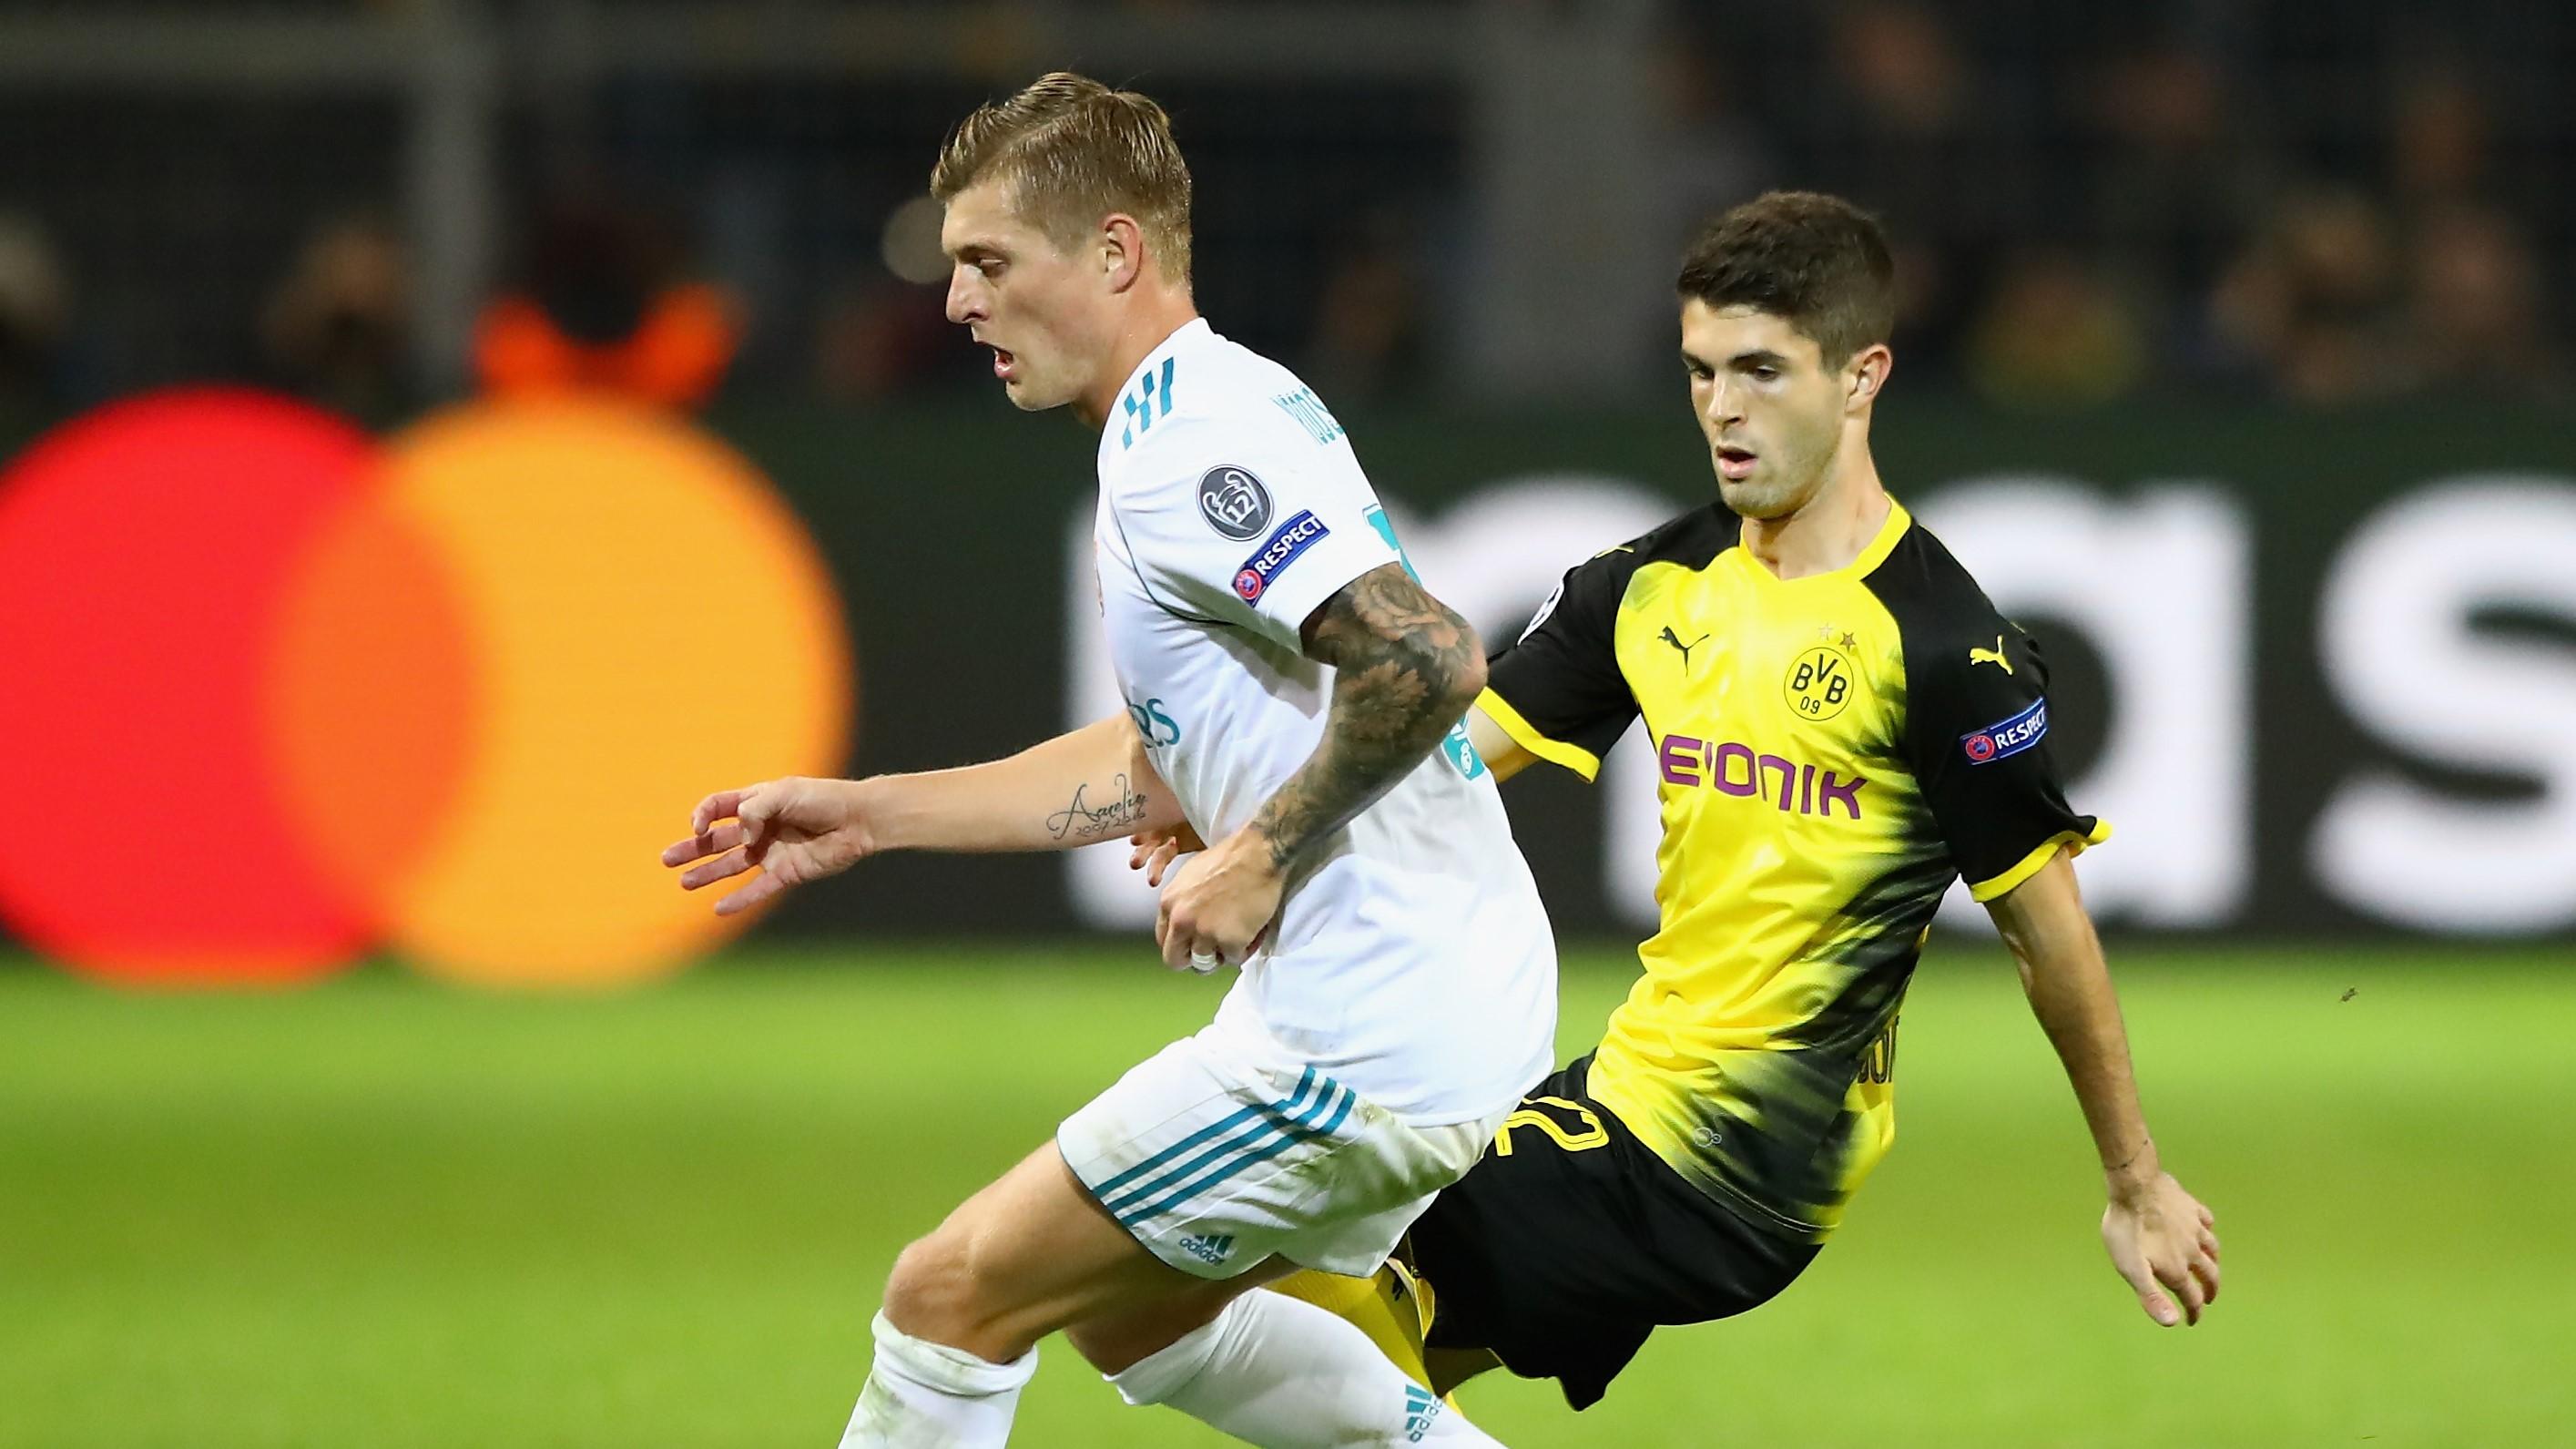 Toni Kroos Christian Pulisic Borussia Dortmund Real Madrid UCL 26092017